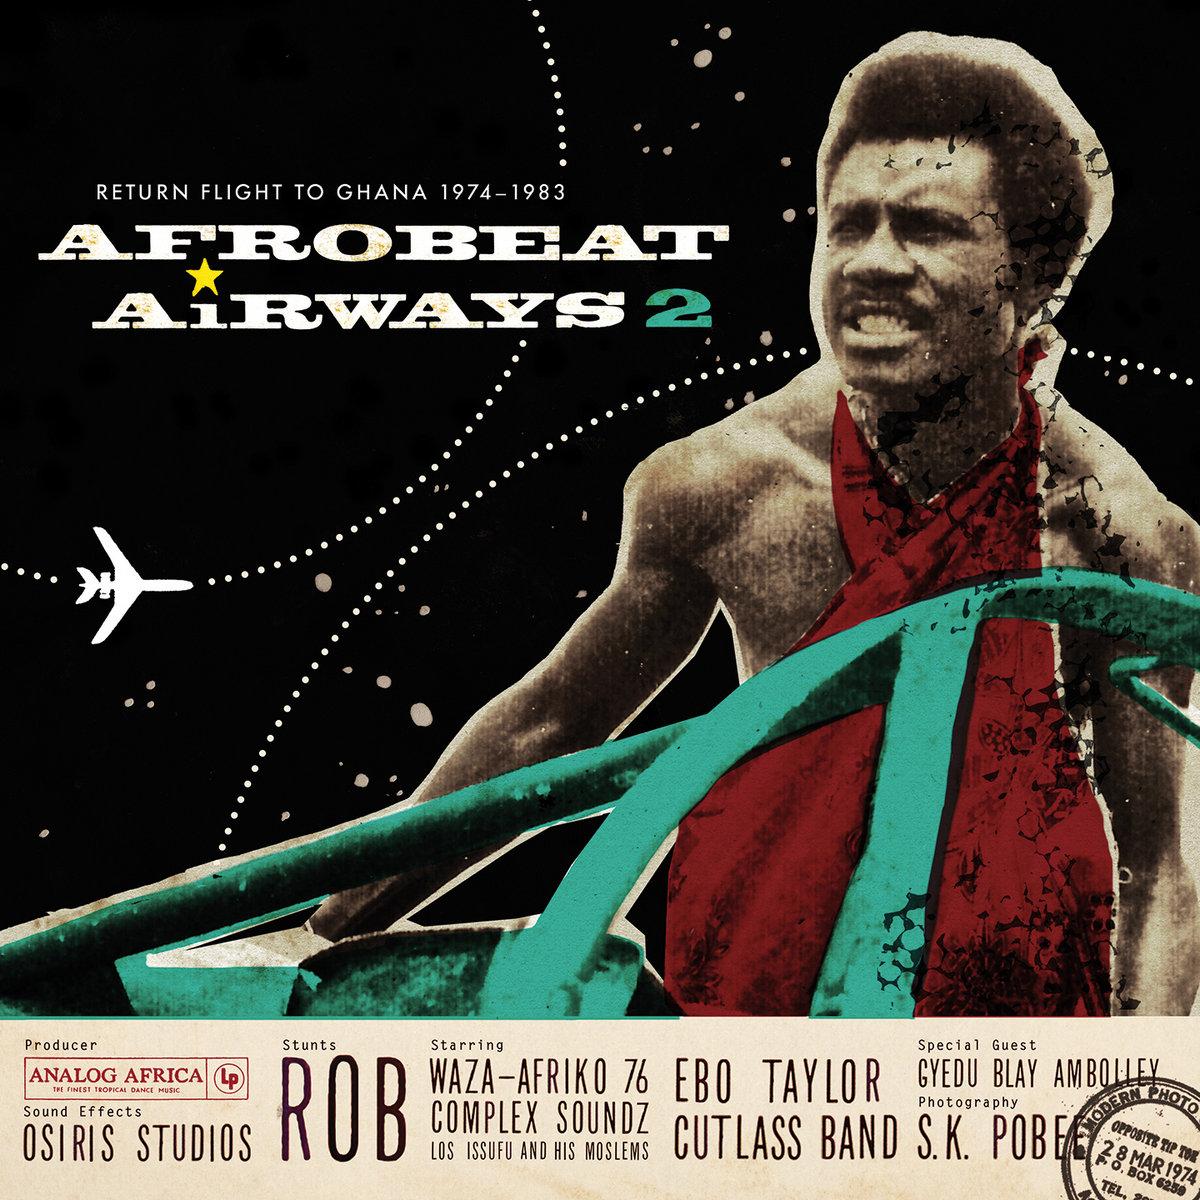 Afrobeat Airways 2 - Return Flight To Ghana 1974-1983 | Analog Africa